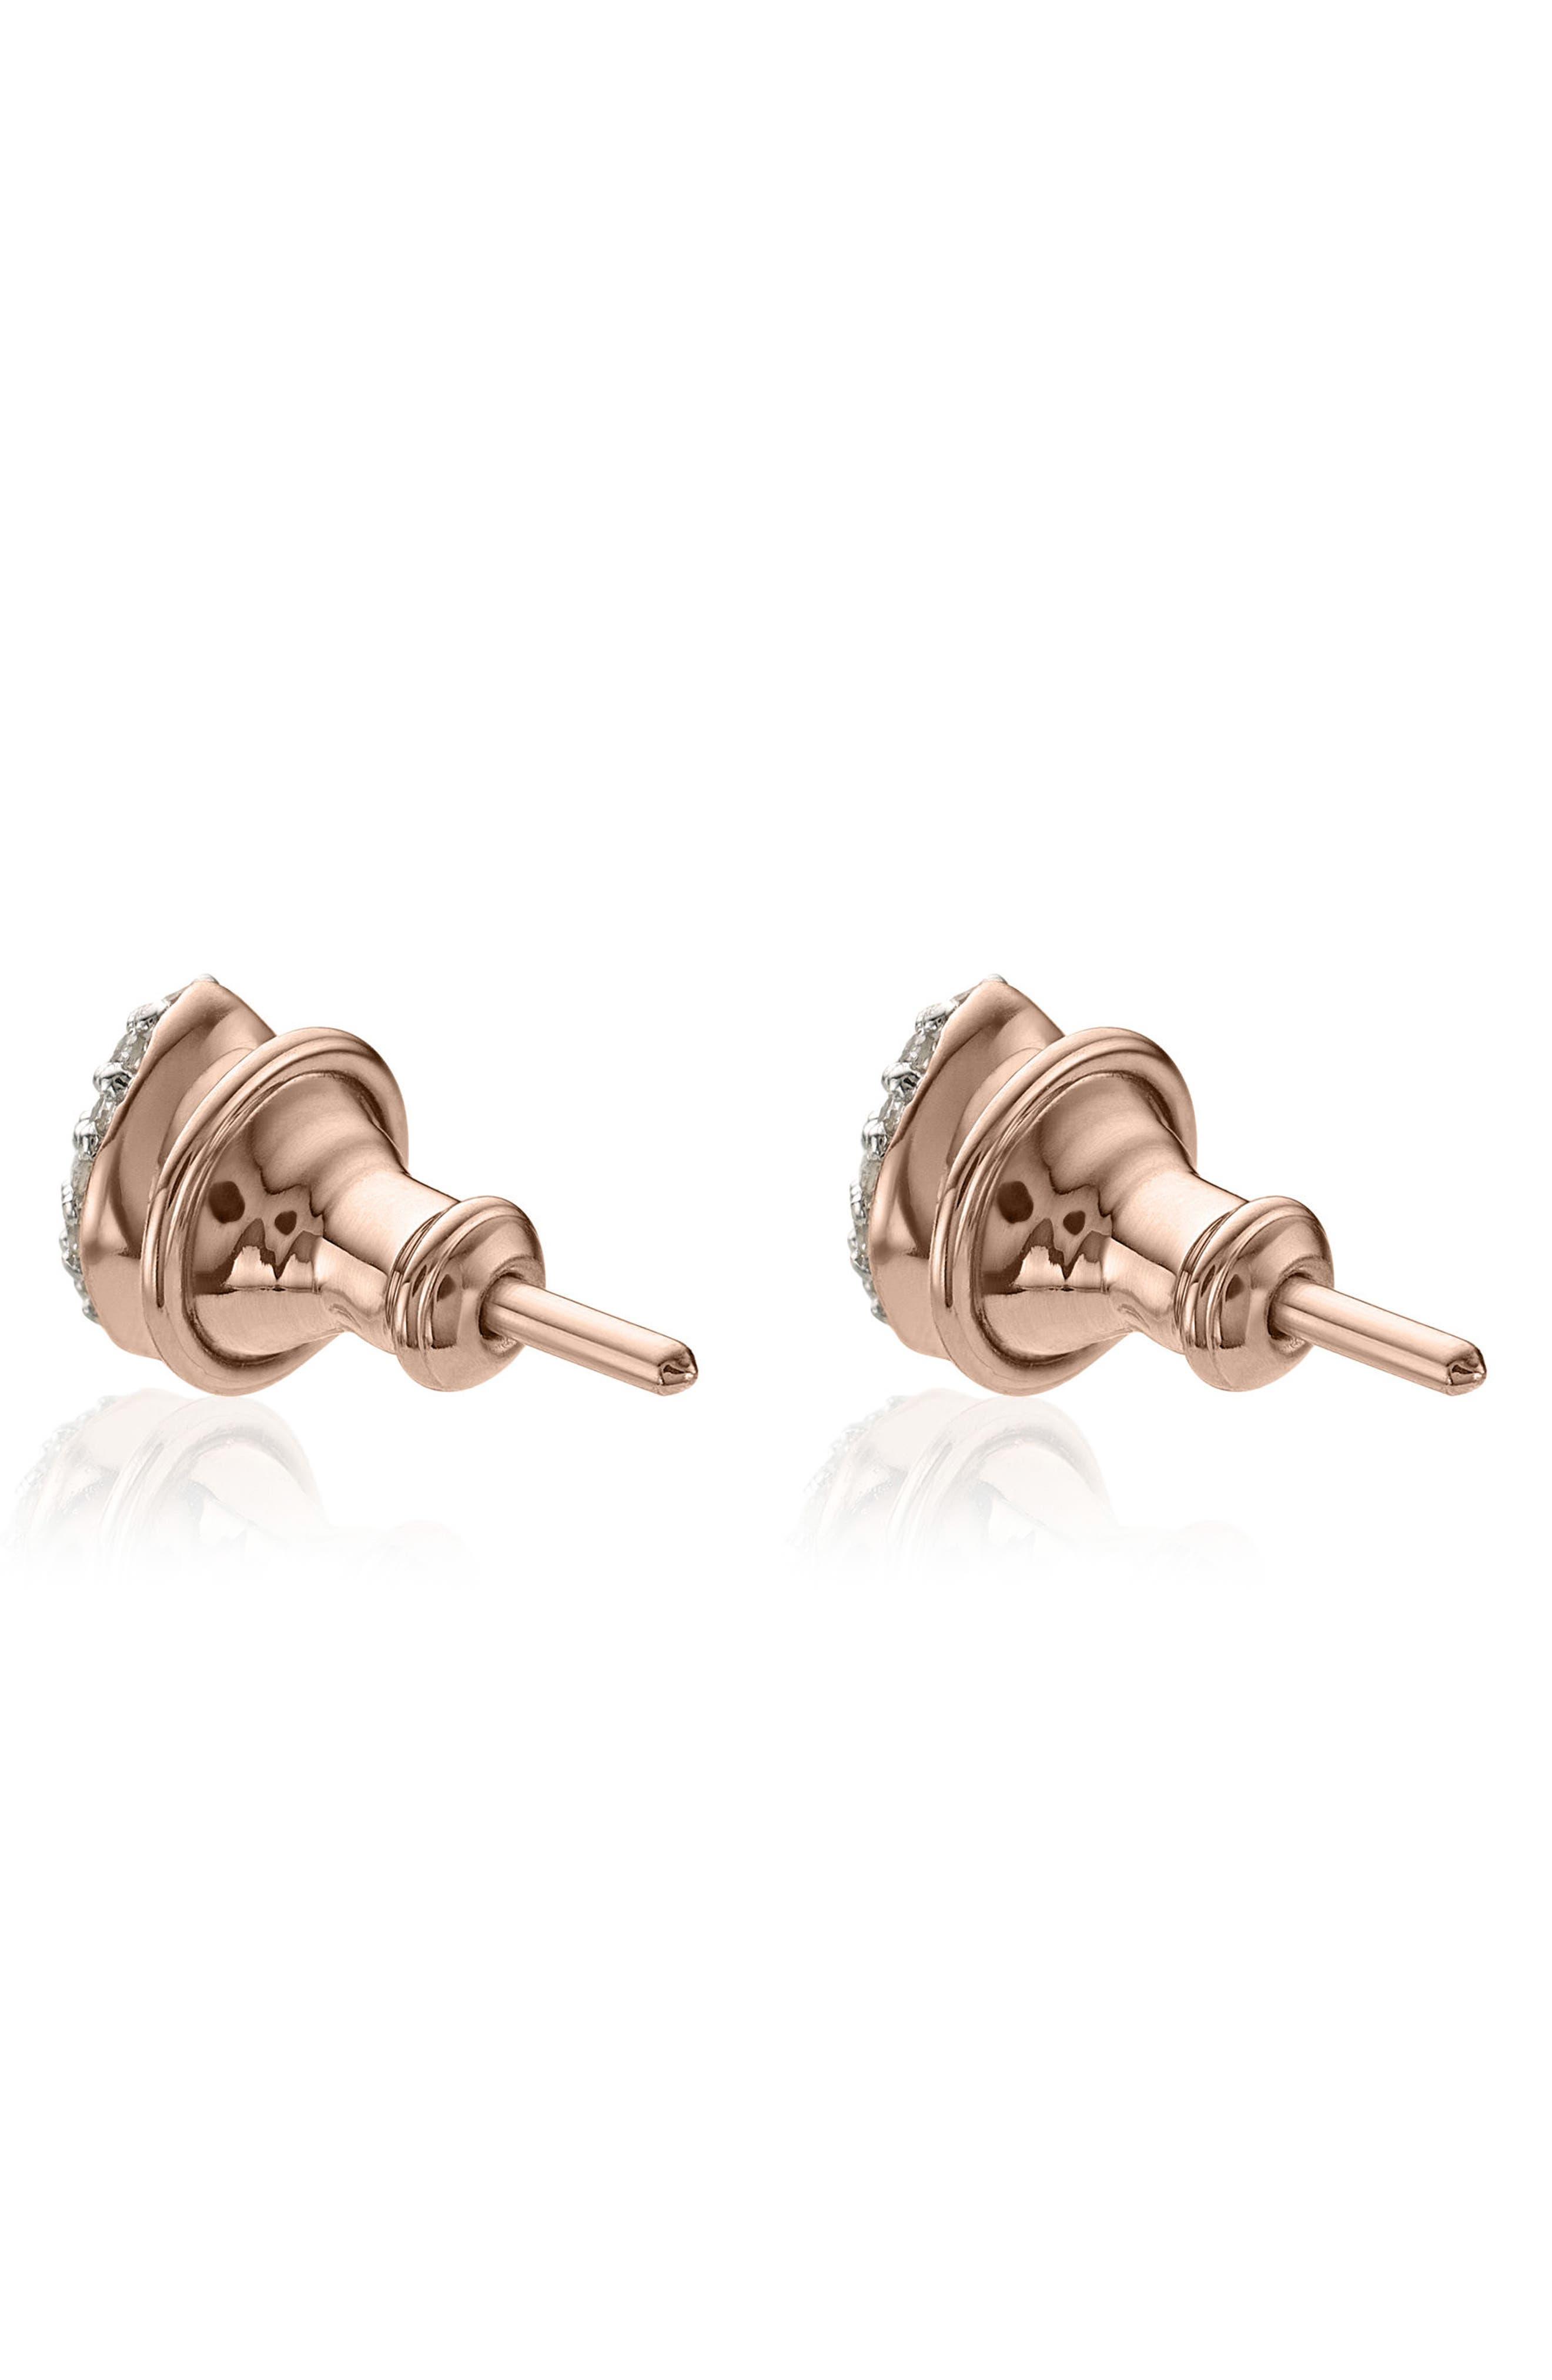 MONICA VINADER, Nura Mini Diamond Stud Earrings, Alternate thumbnail 2, color, ROSE GOLD/ DIAMOND